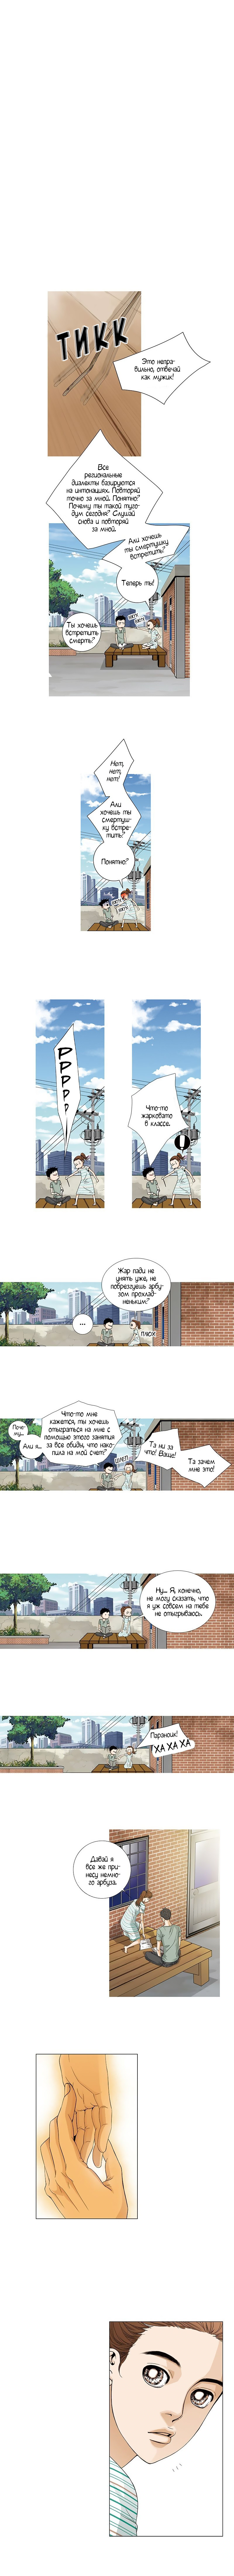 https://r1.ninemanga.com/comics/pic2/29/28573/344330/1512078542452.jpg Page 4